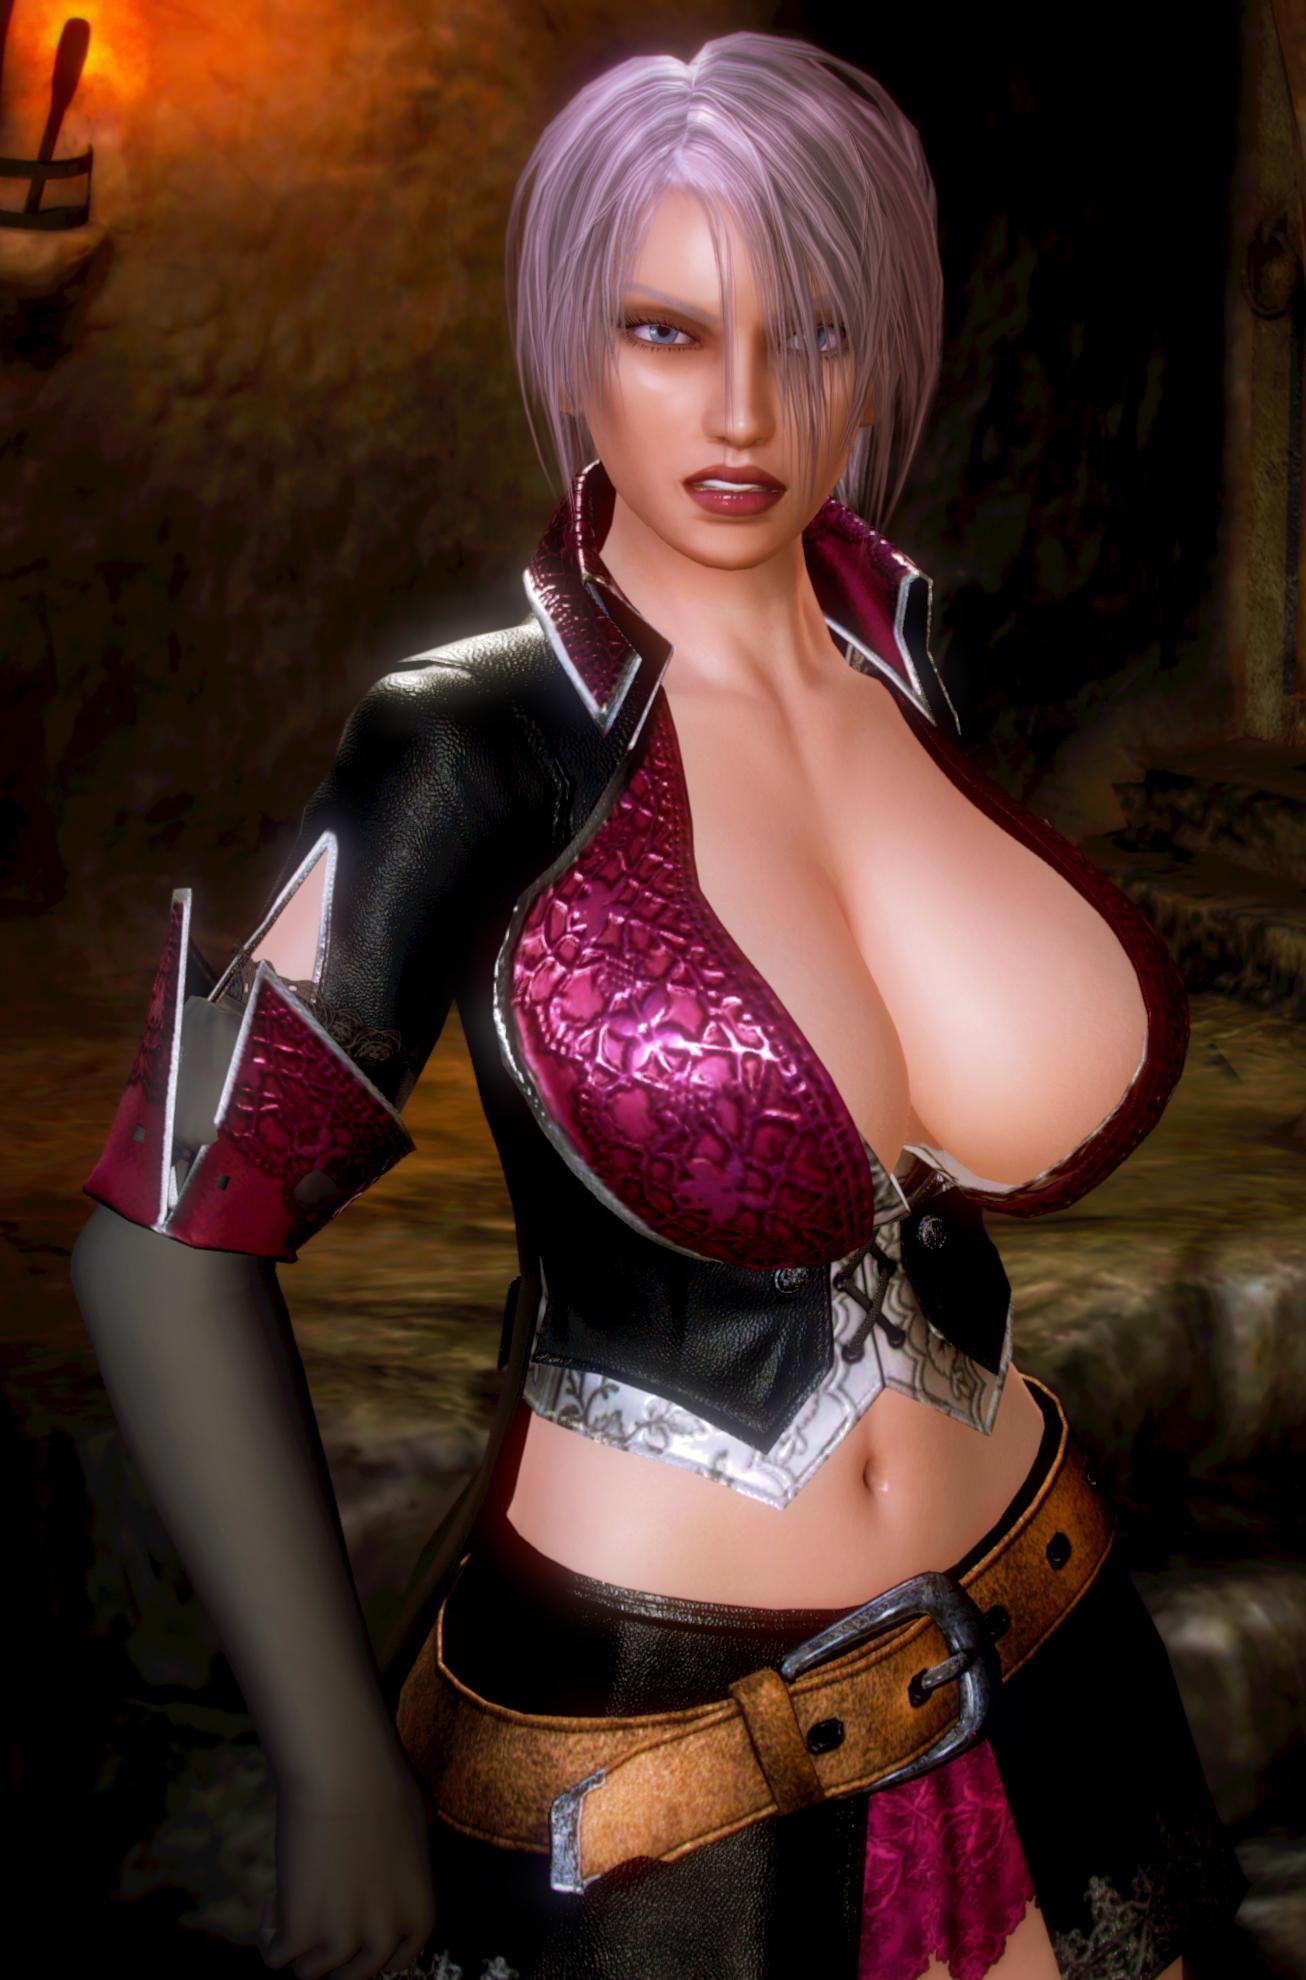 Soul calibur nude patch porn anime images